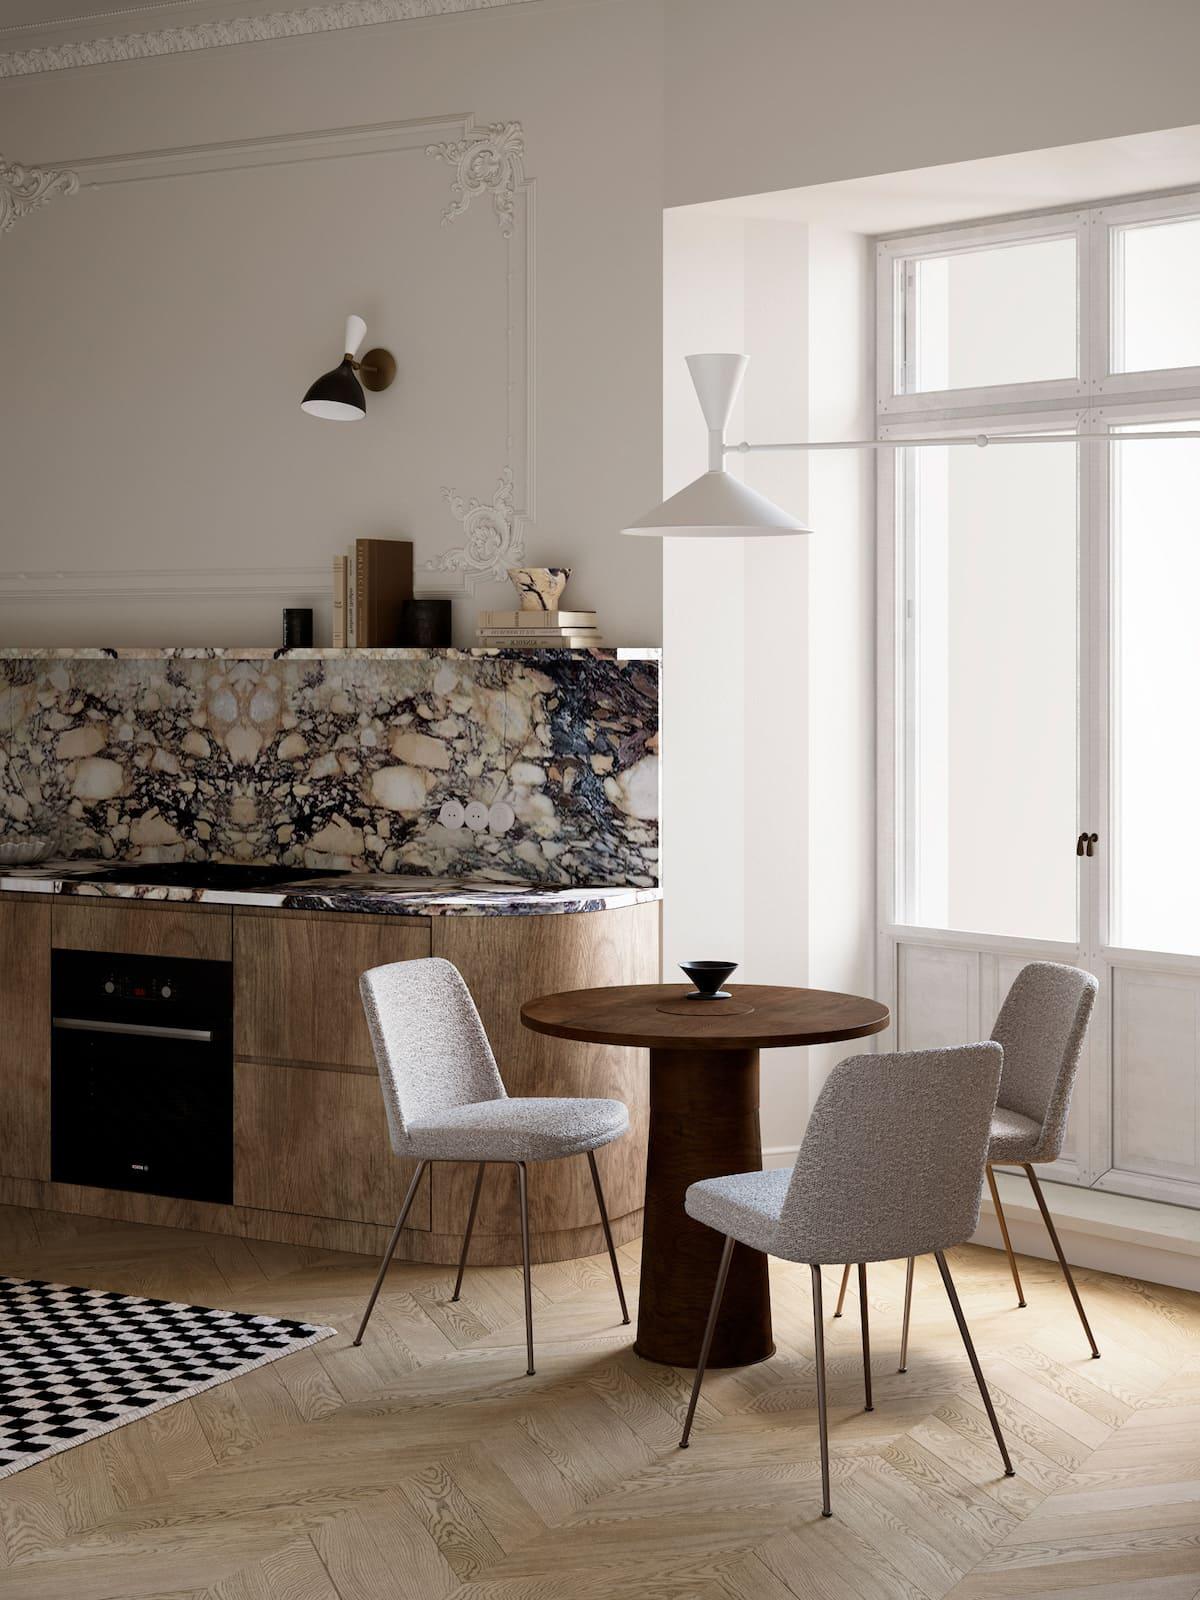 модный дизайн интерьера квартиры фото 15